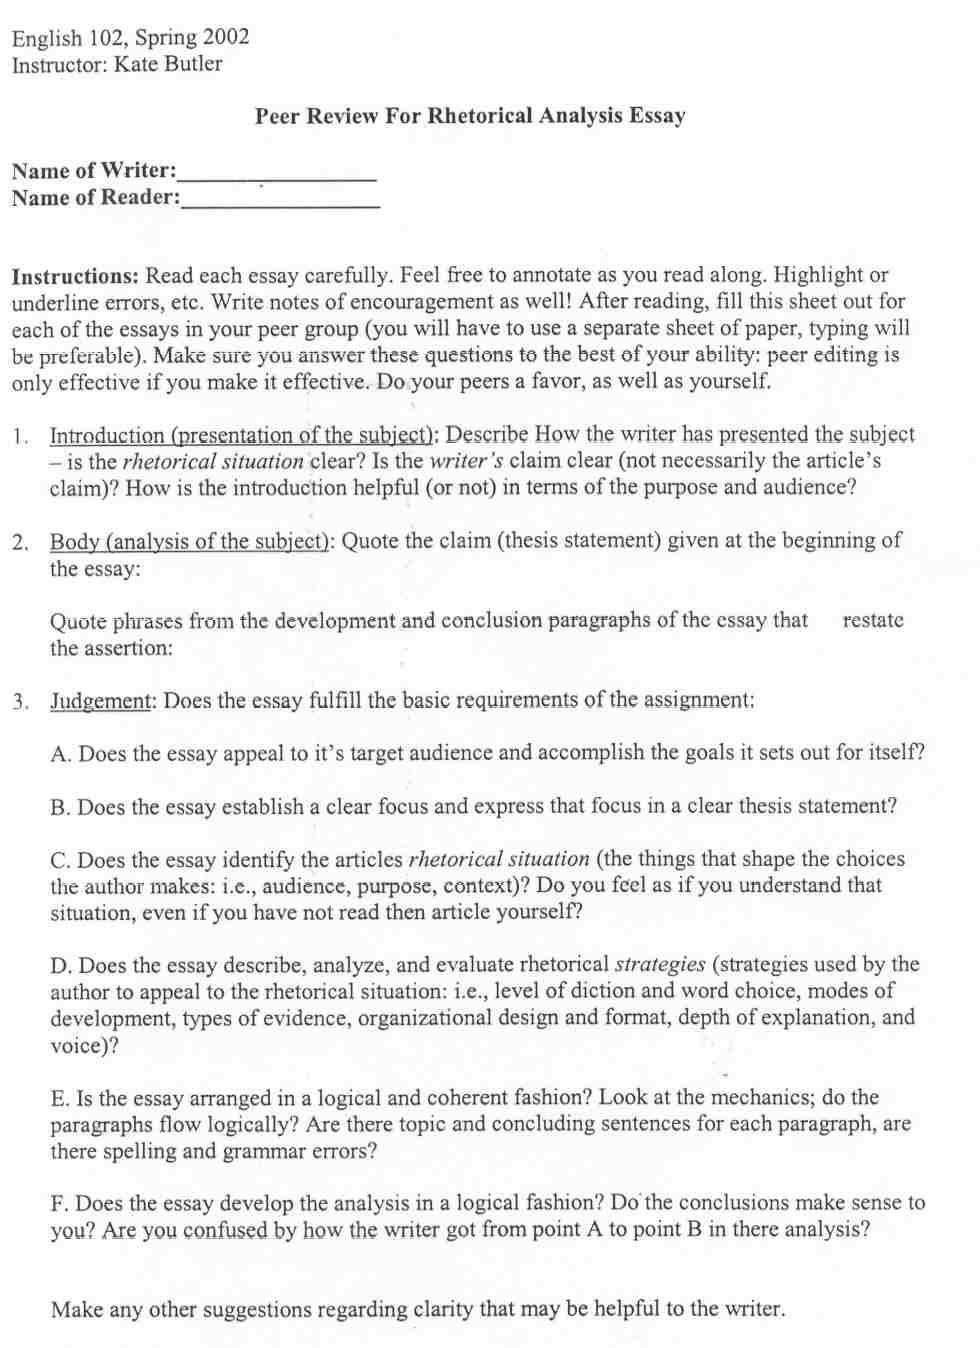 how to write a rhetorical analysis essay x reader